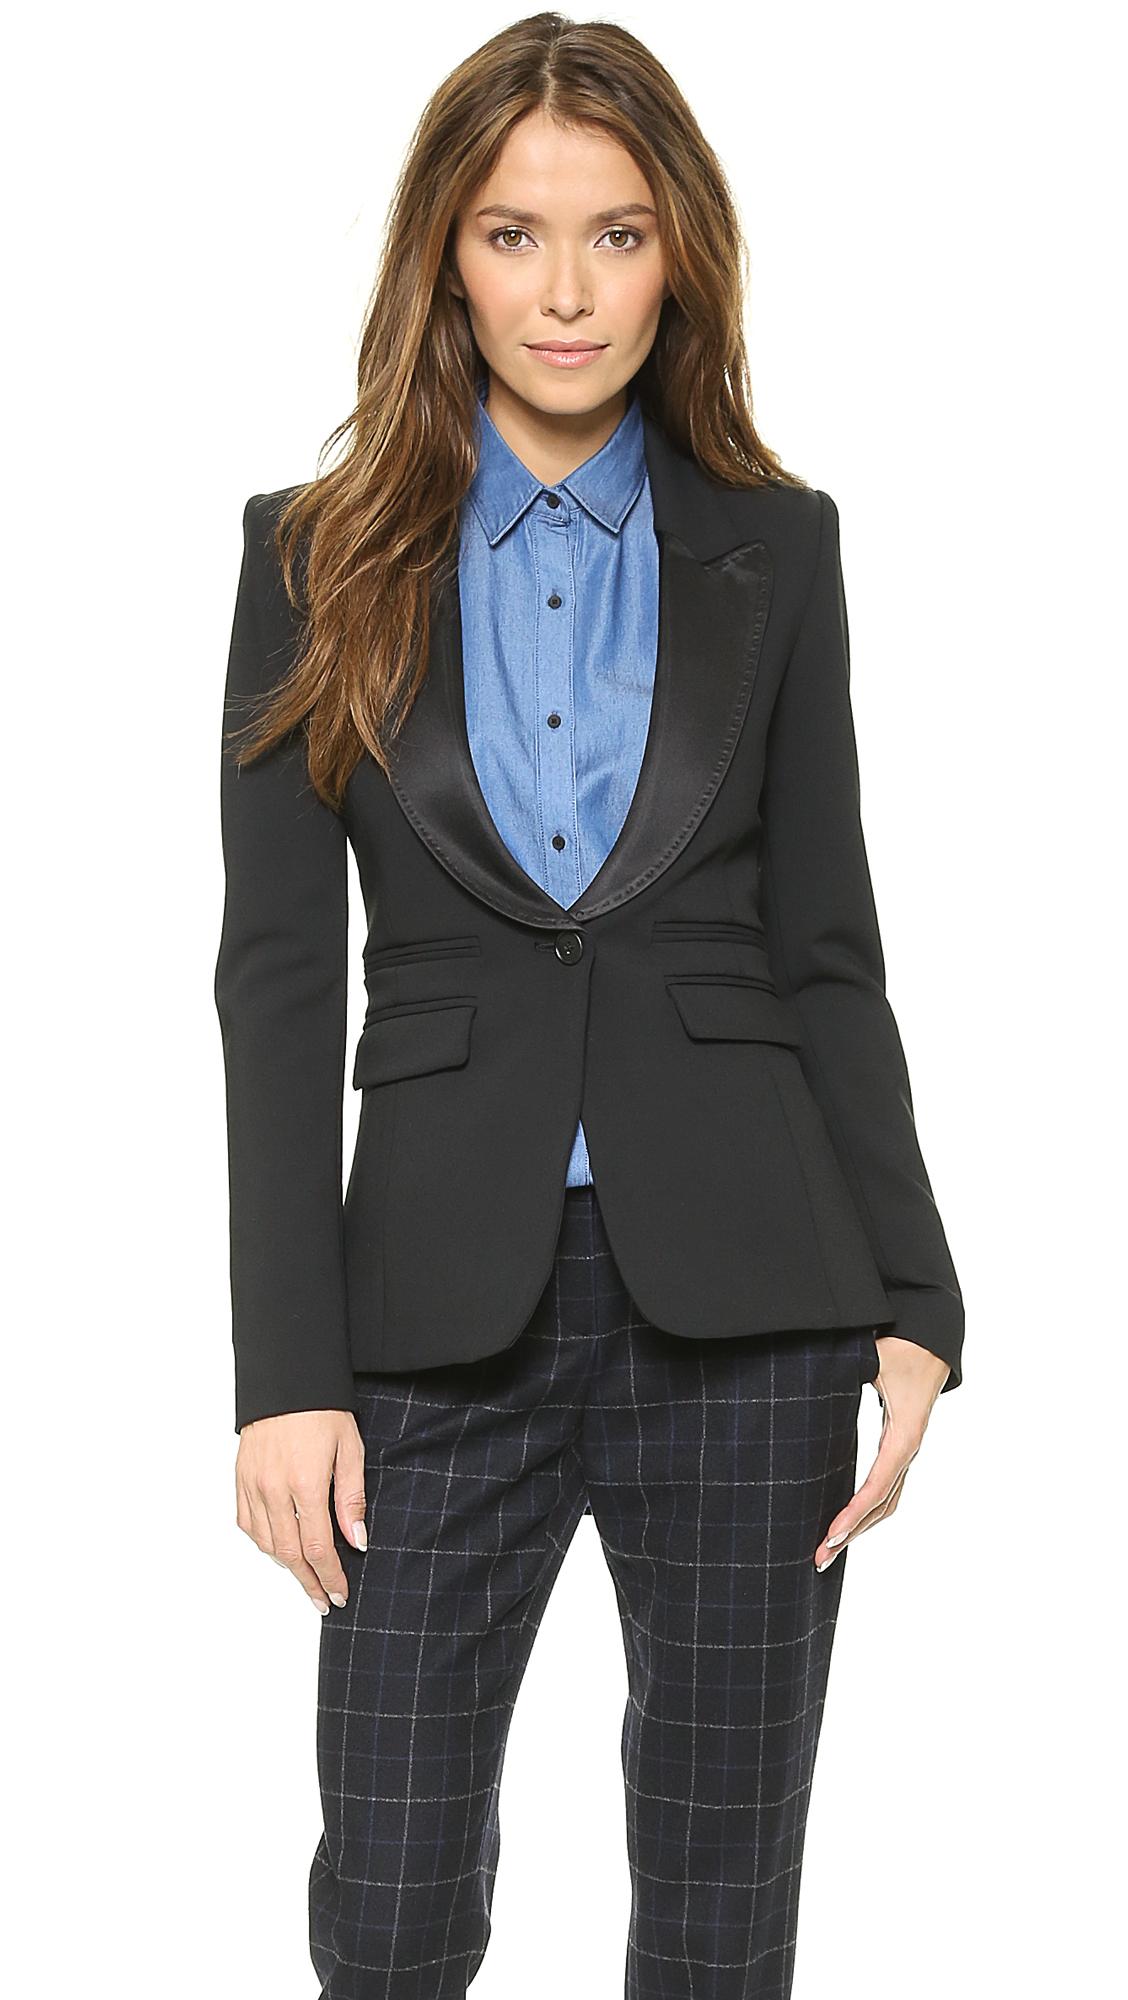 Lyst smythe peaked lapel tuxedo blazer black in black for Smythe mercedes benz